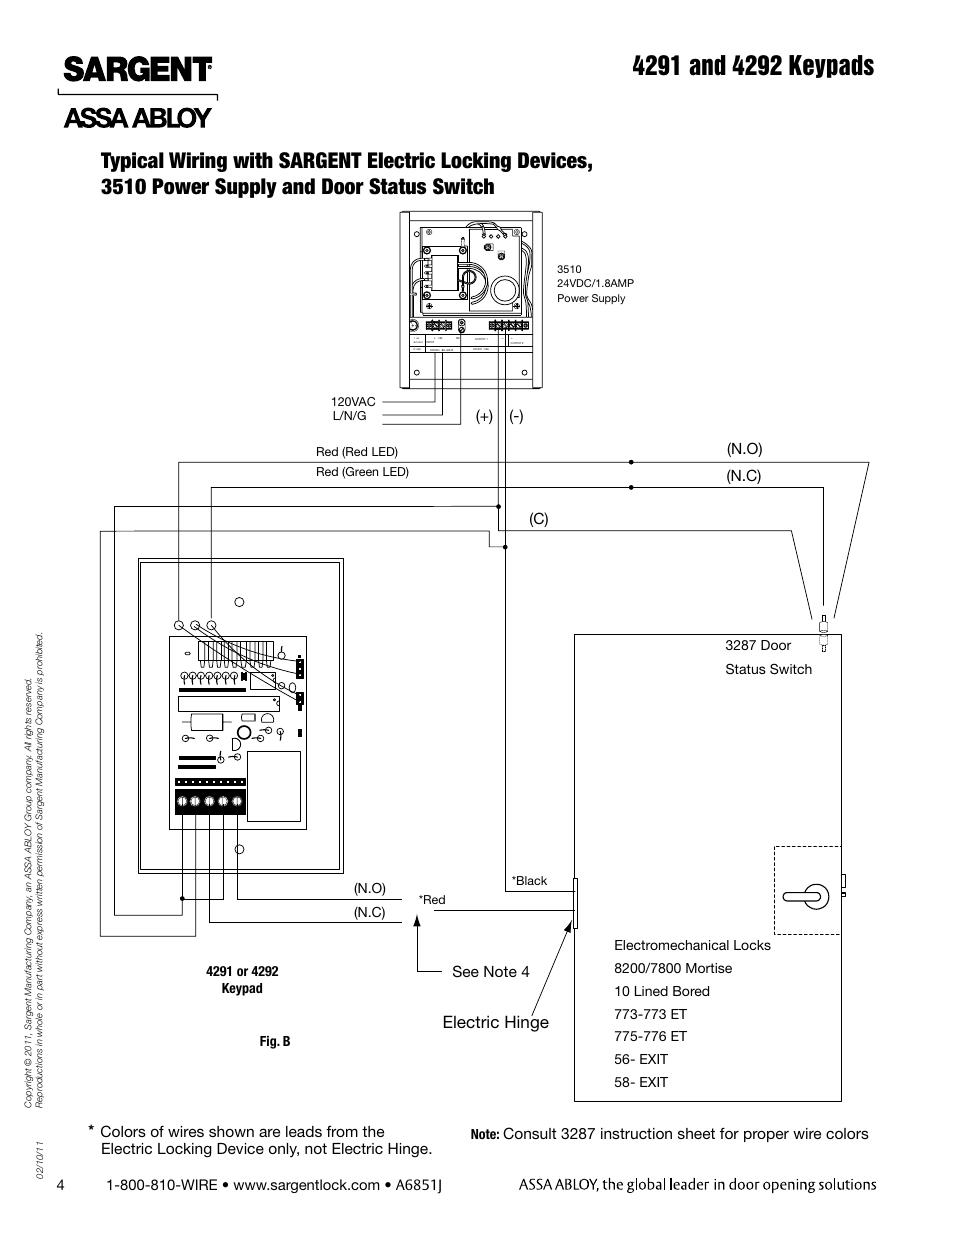 Electric hinge, C) (n o) (n c) | SARGENT 4292 Keypads User Manual